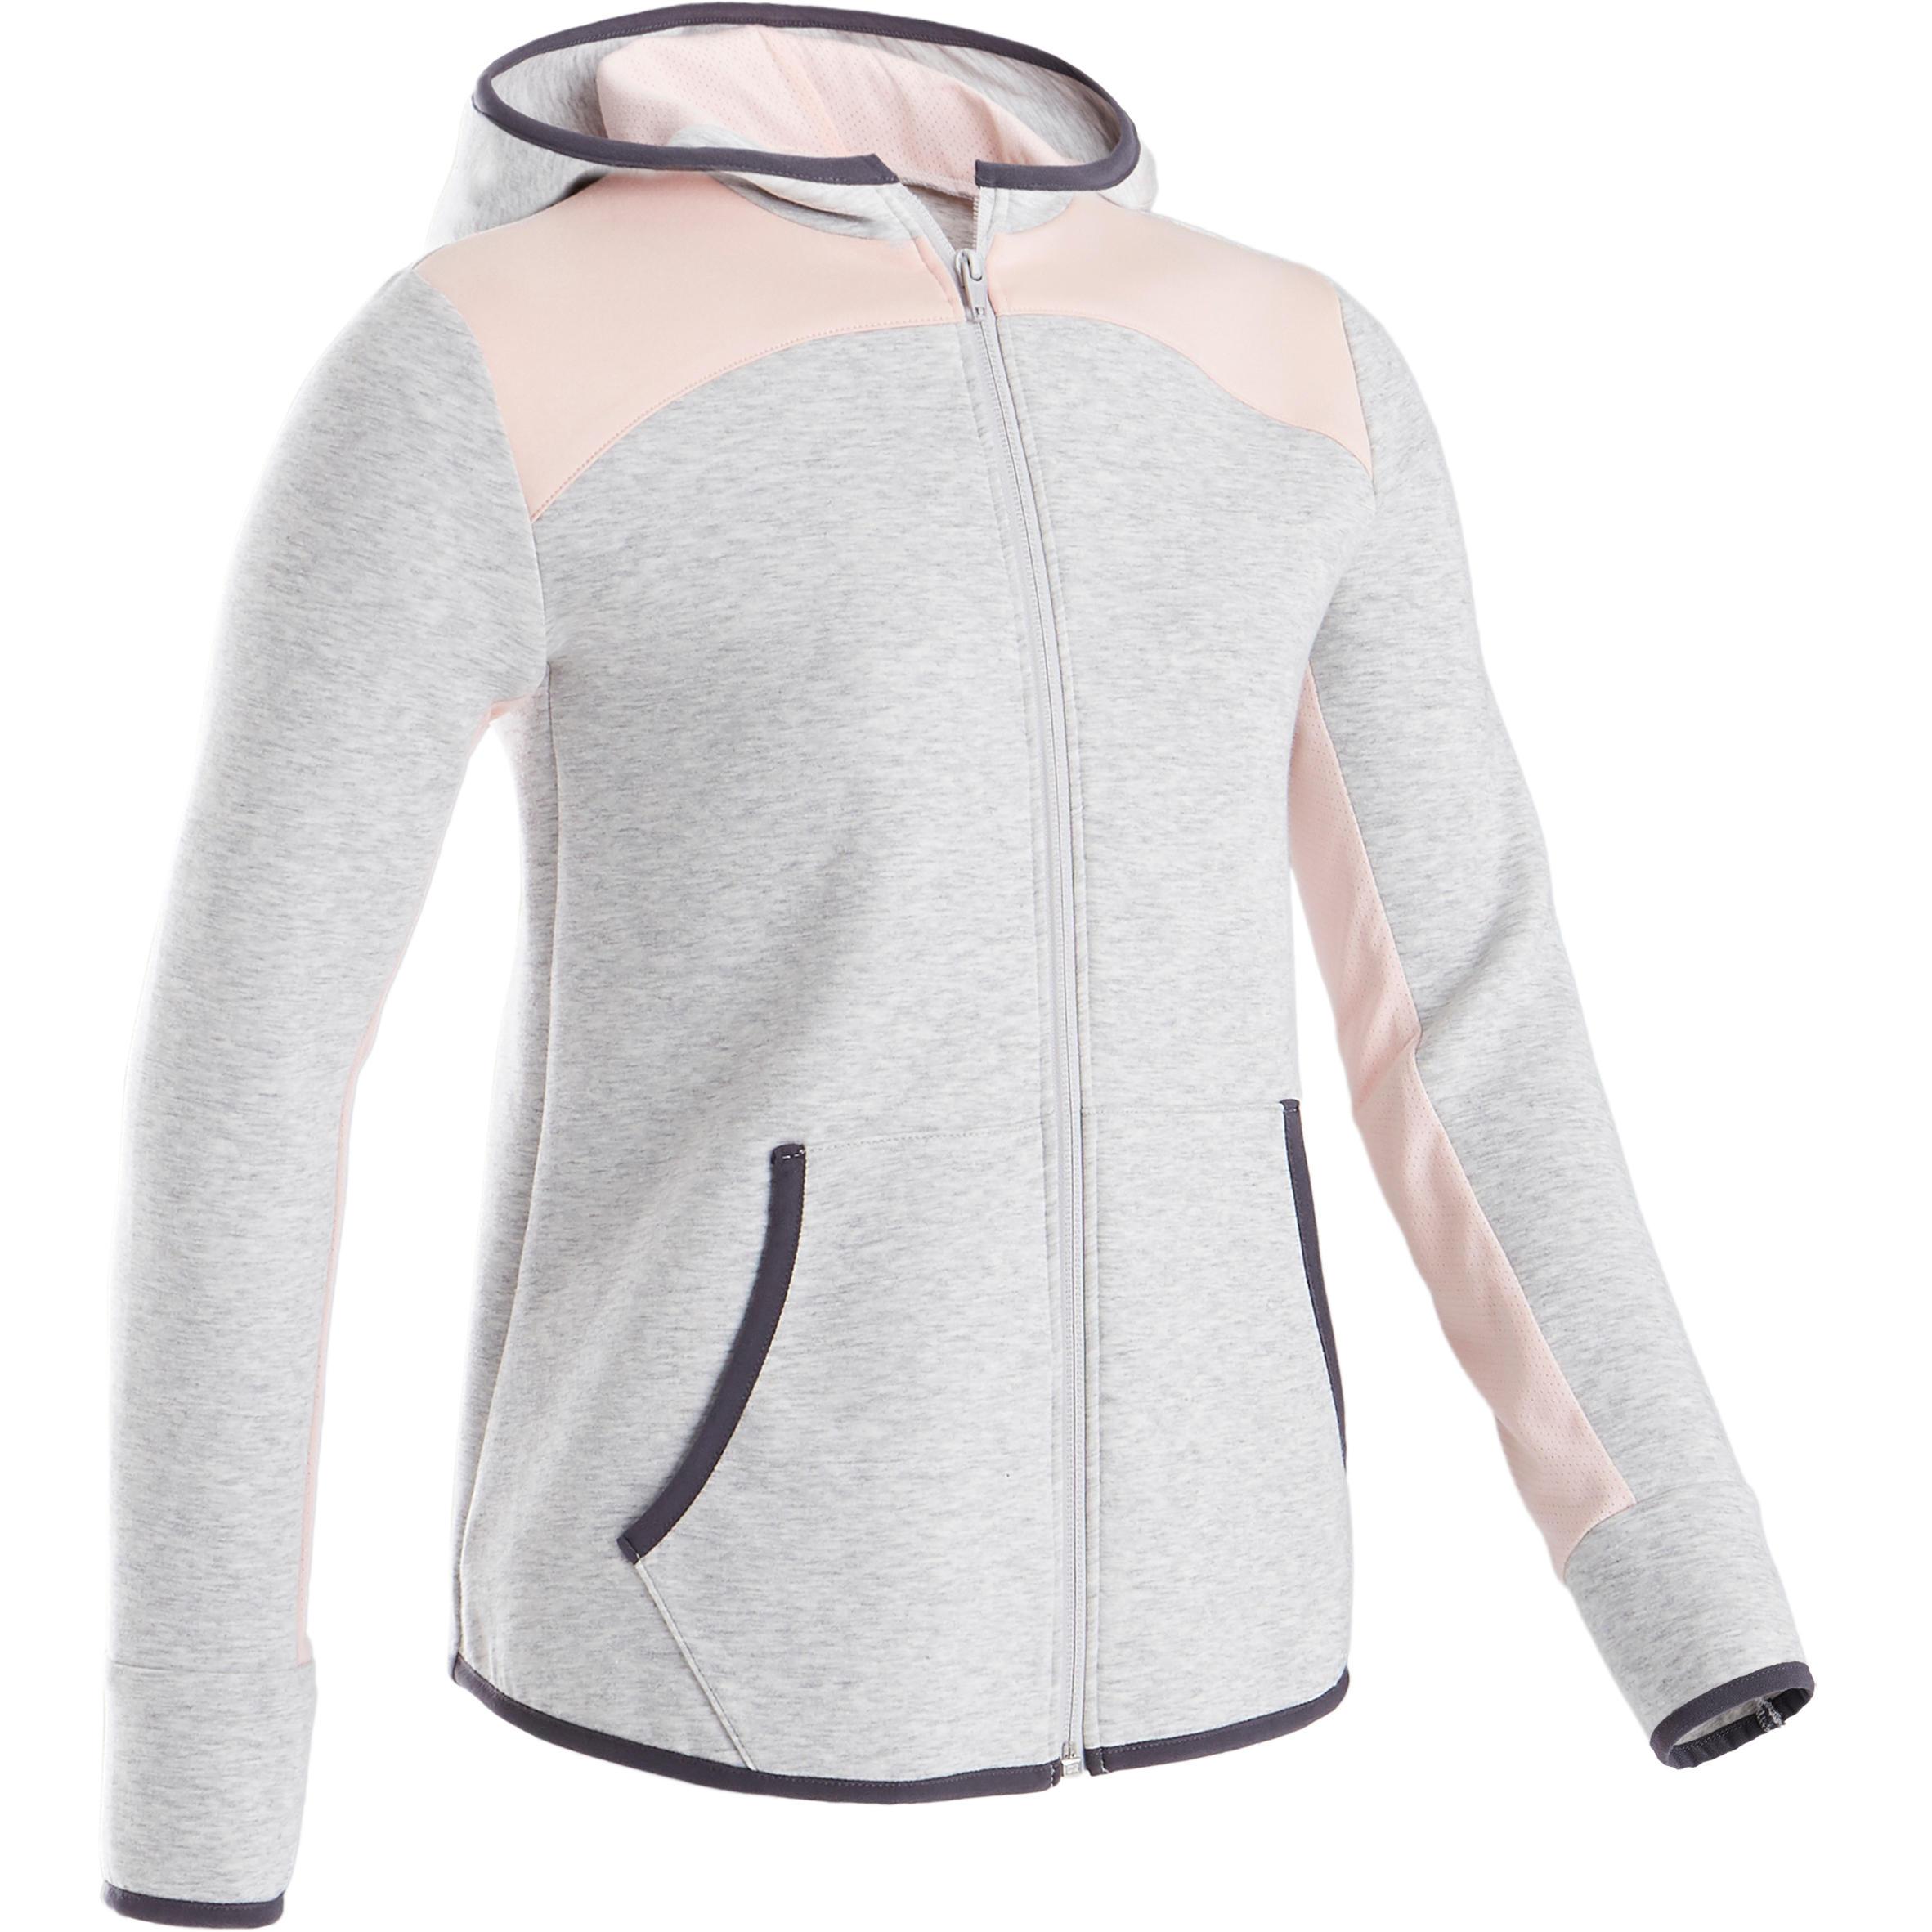 Jachetă 500 fete